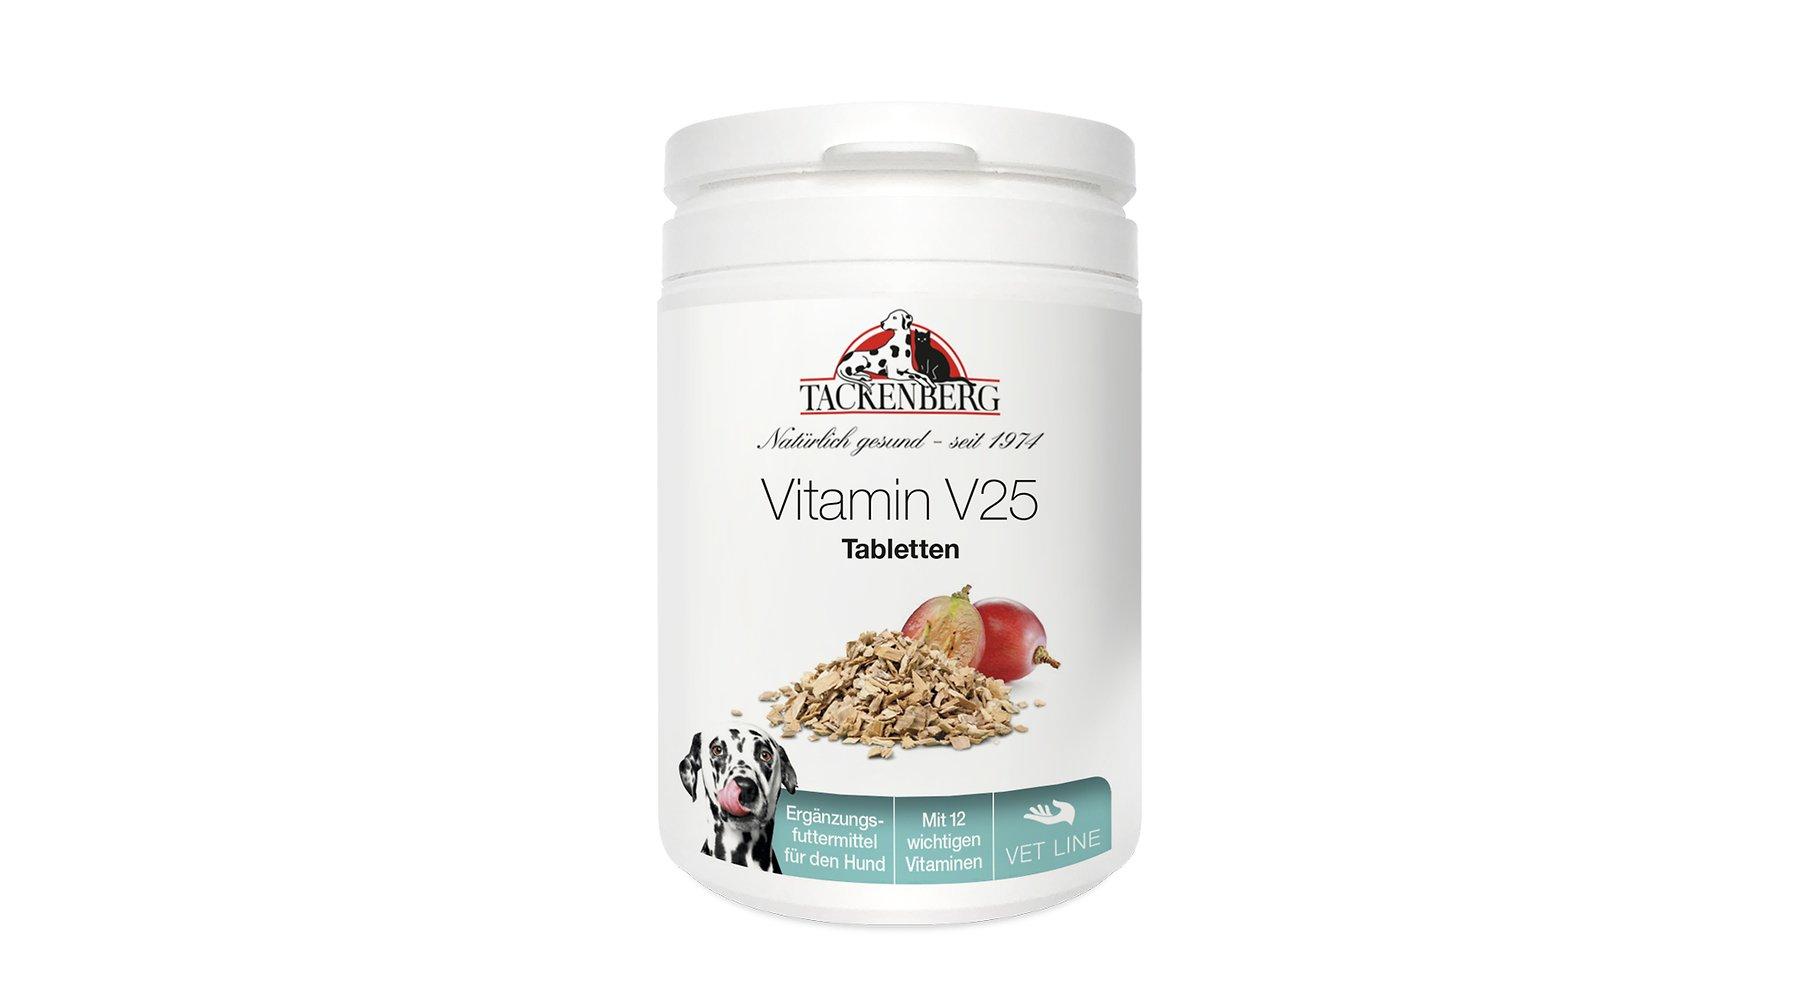 TACKENBERG Vitamin V25